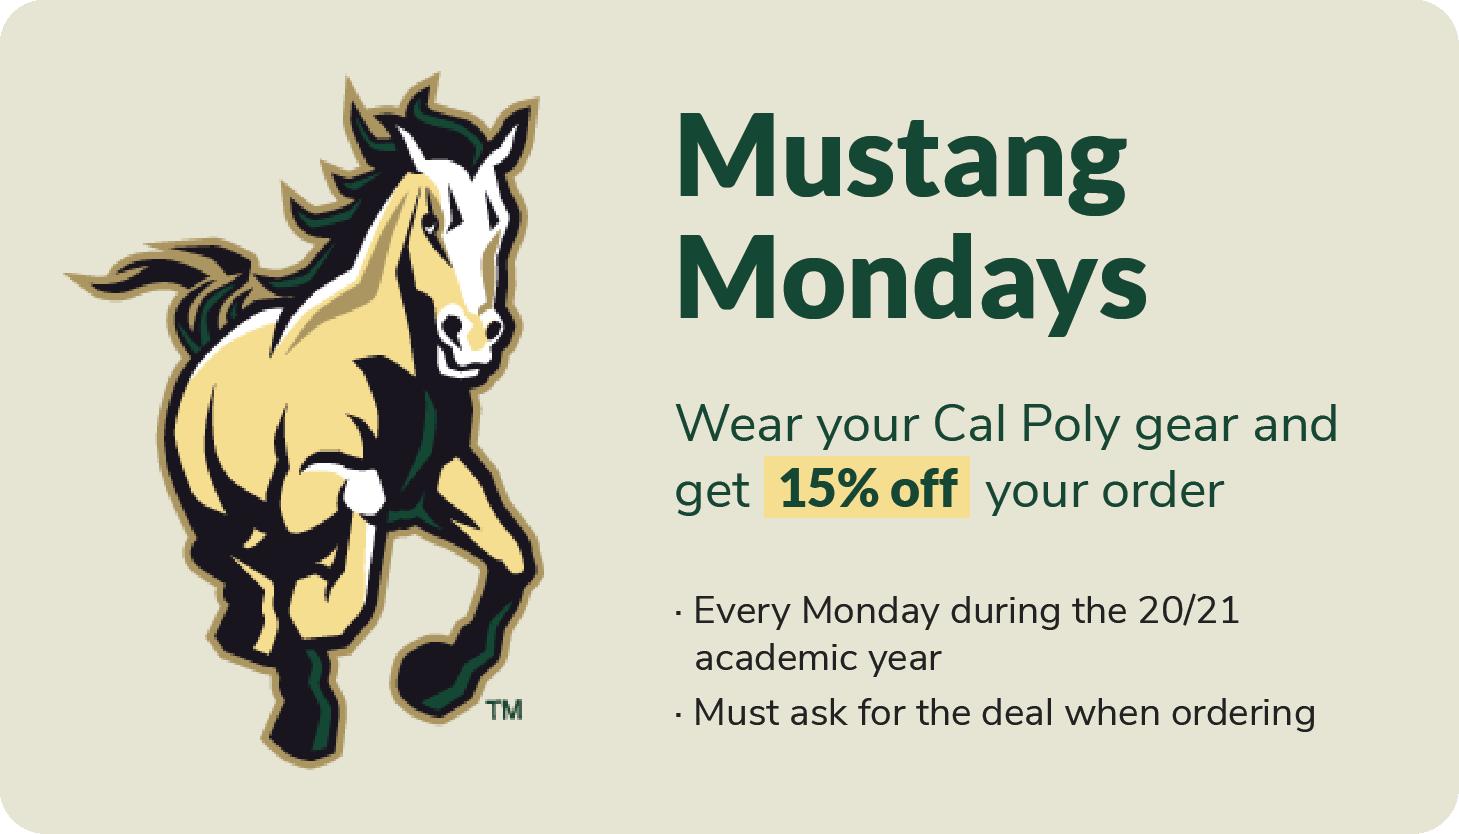 Mustang Mondays